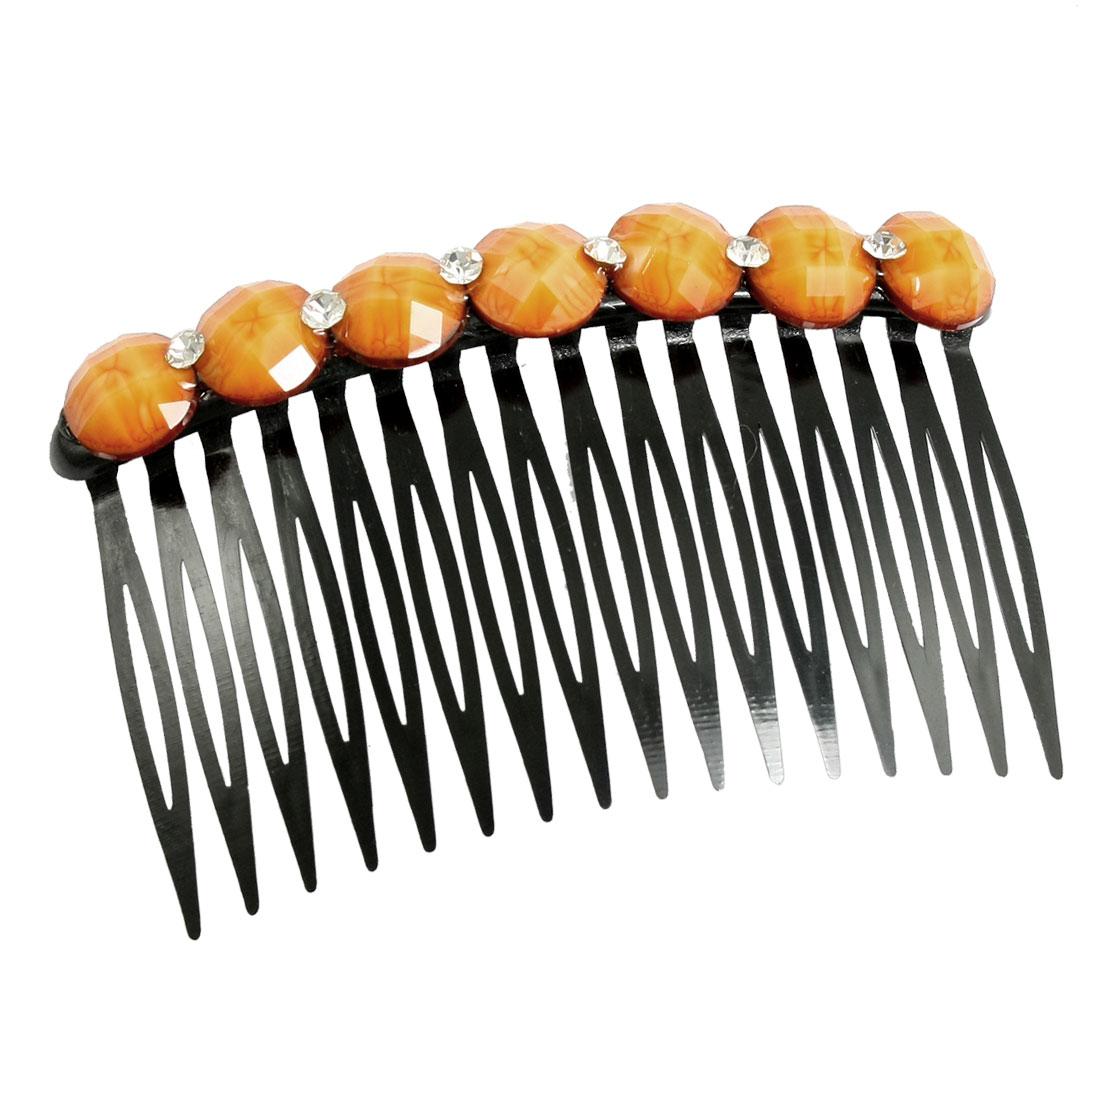 Lady Bling Bling Rhinestone Accent 16 Teeth Comb Hair Pin Hairclip Orange Black